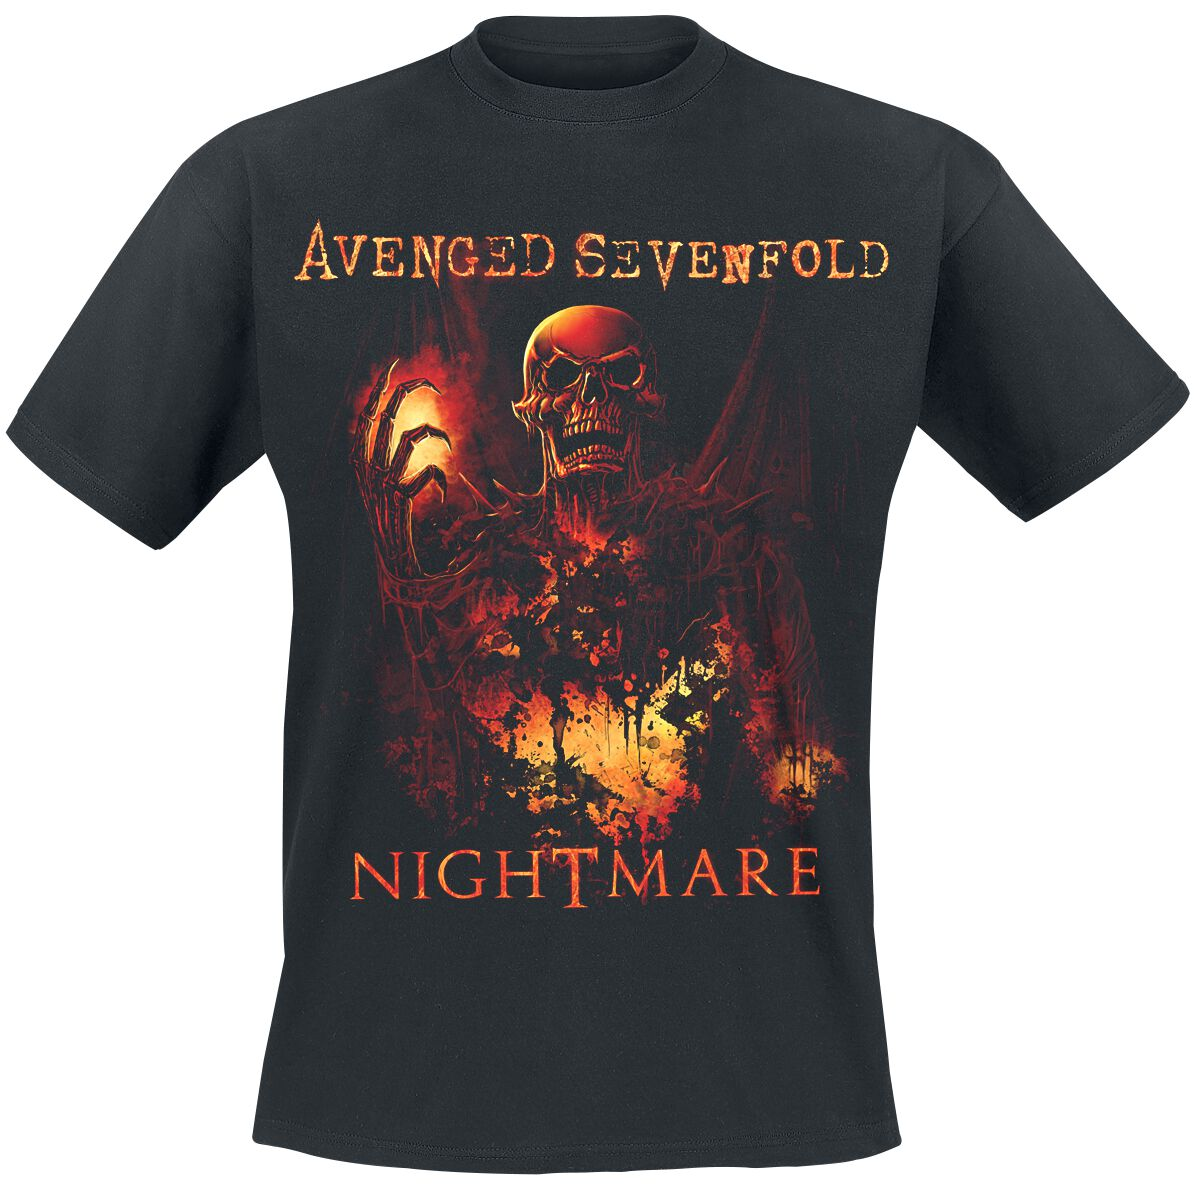 Image of Avenged Sevenfold Nightmare T-Shirt schwarz